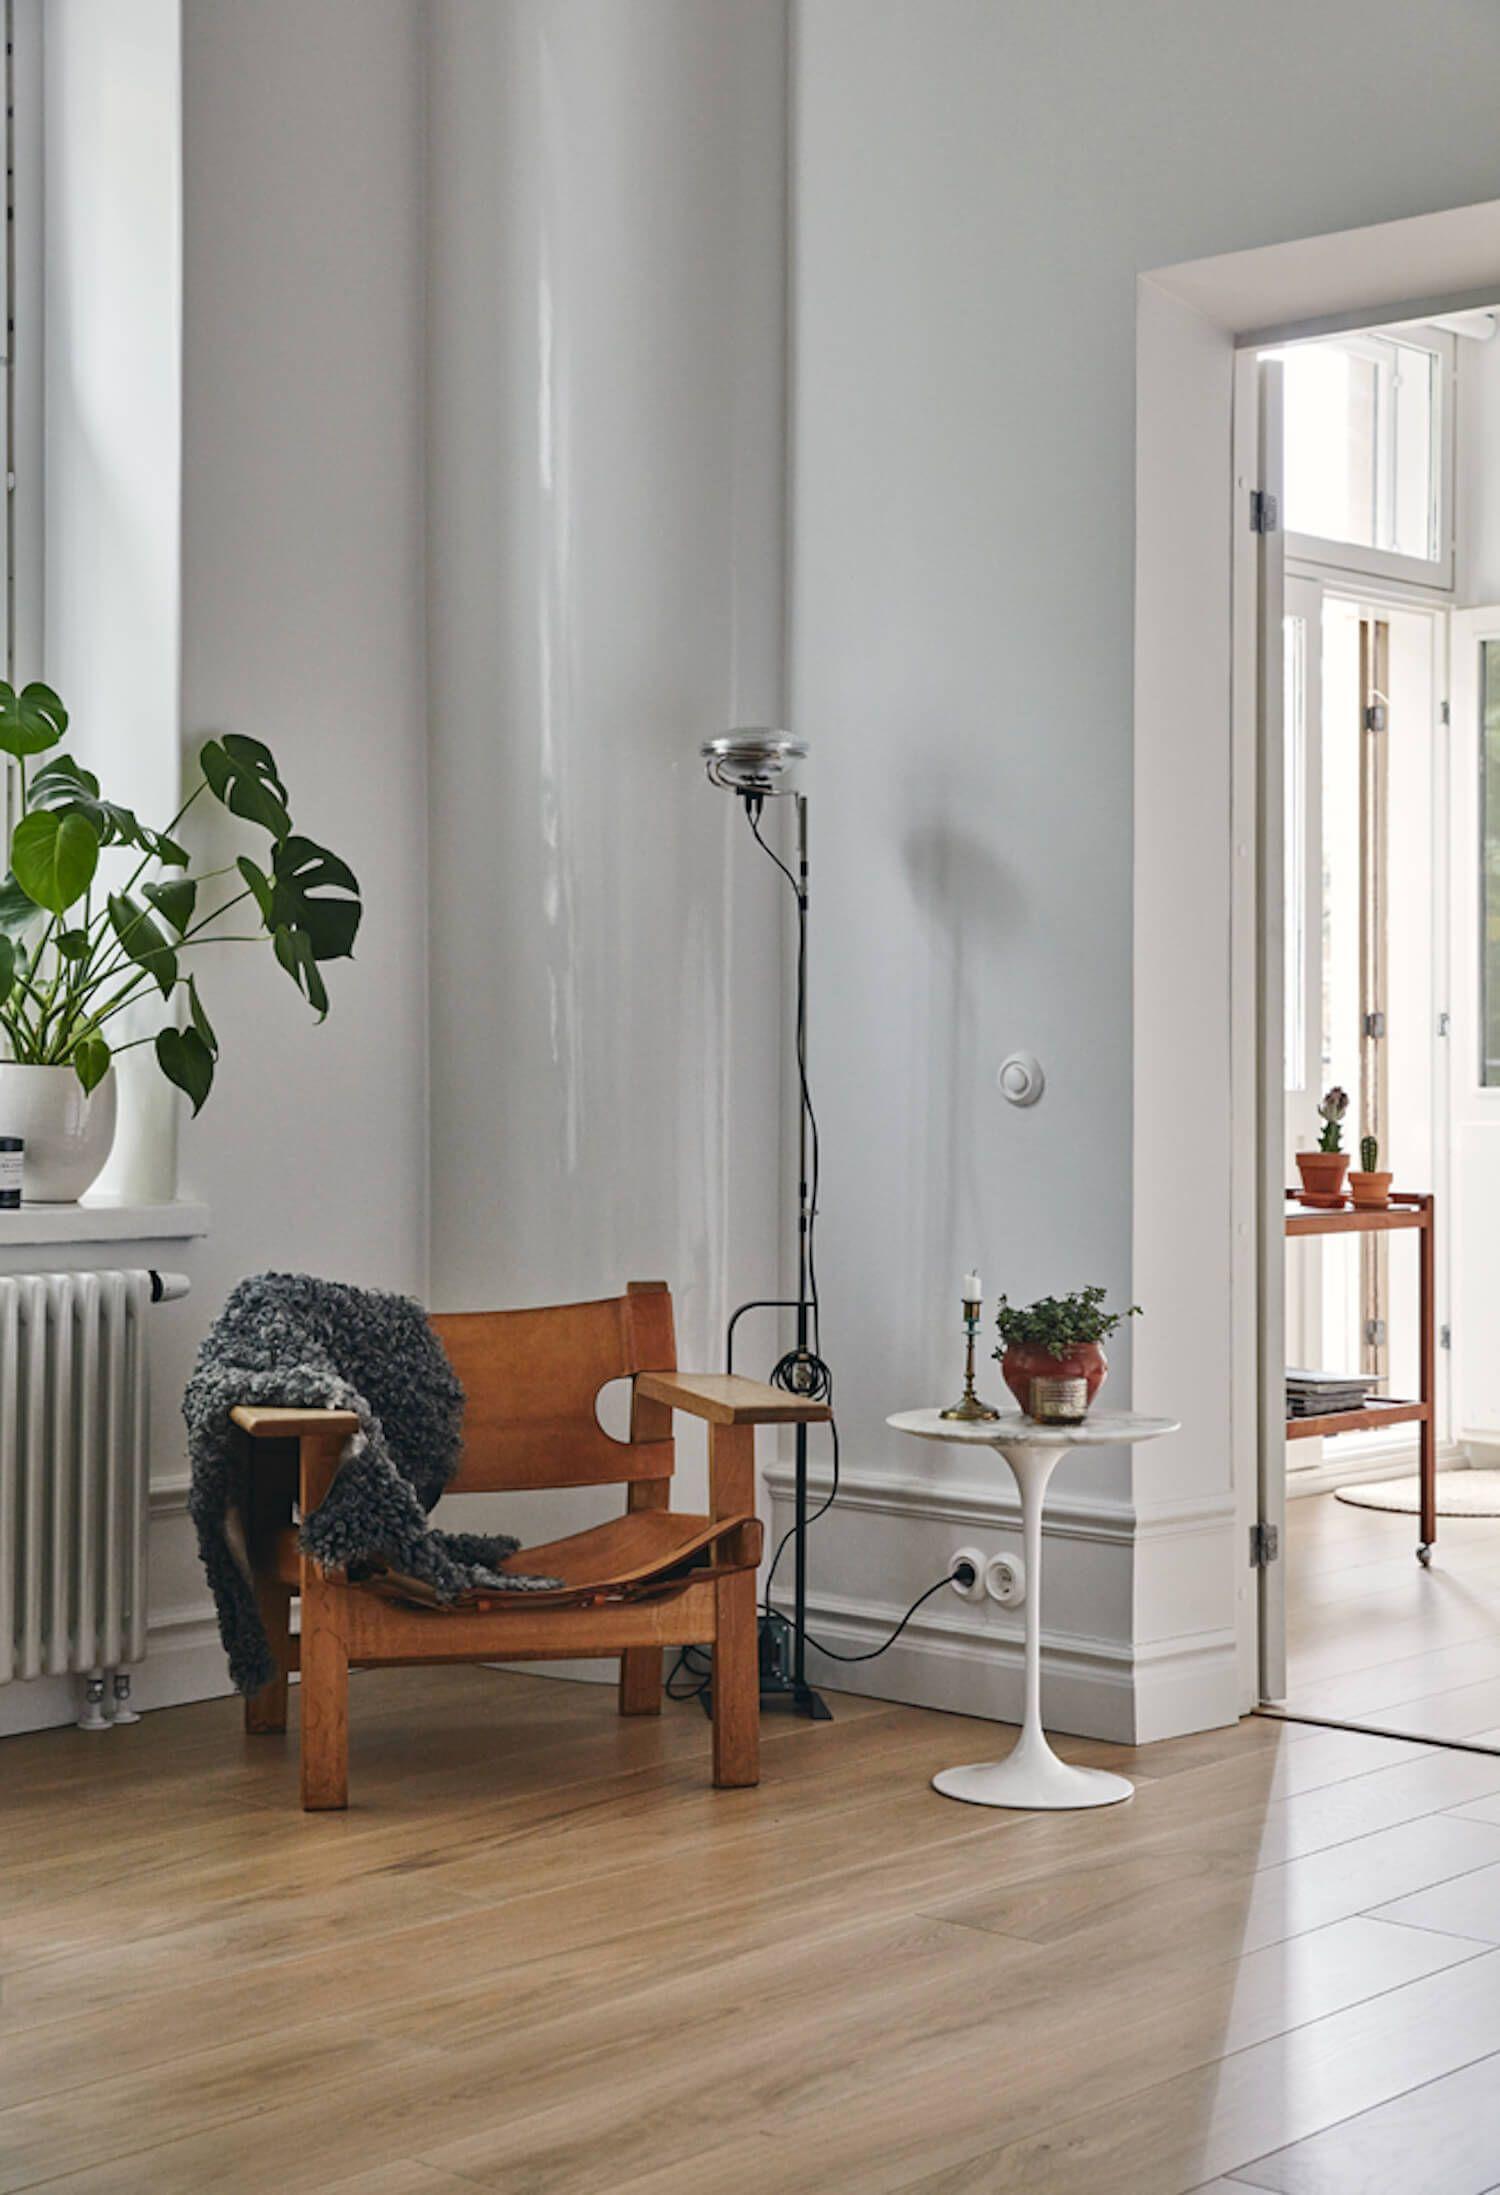 Beautiful home interiors finnish interior architect and designer joanna laajisto works her